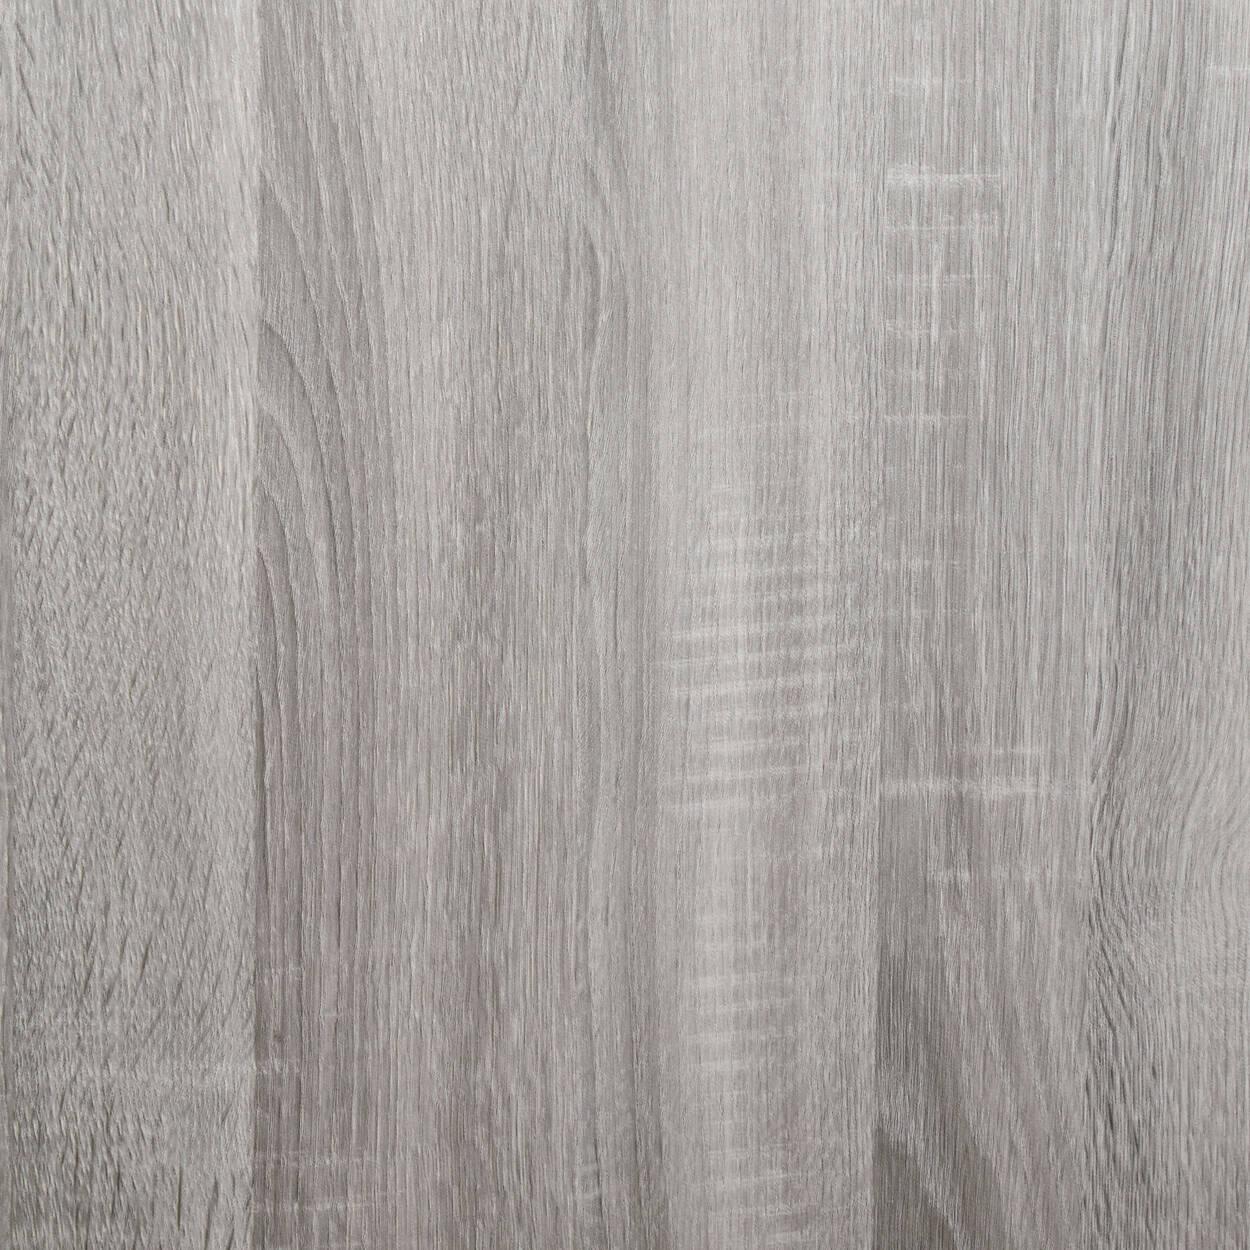 Vinyl Wood Finish and Metal Buffet